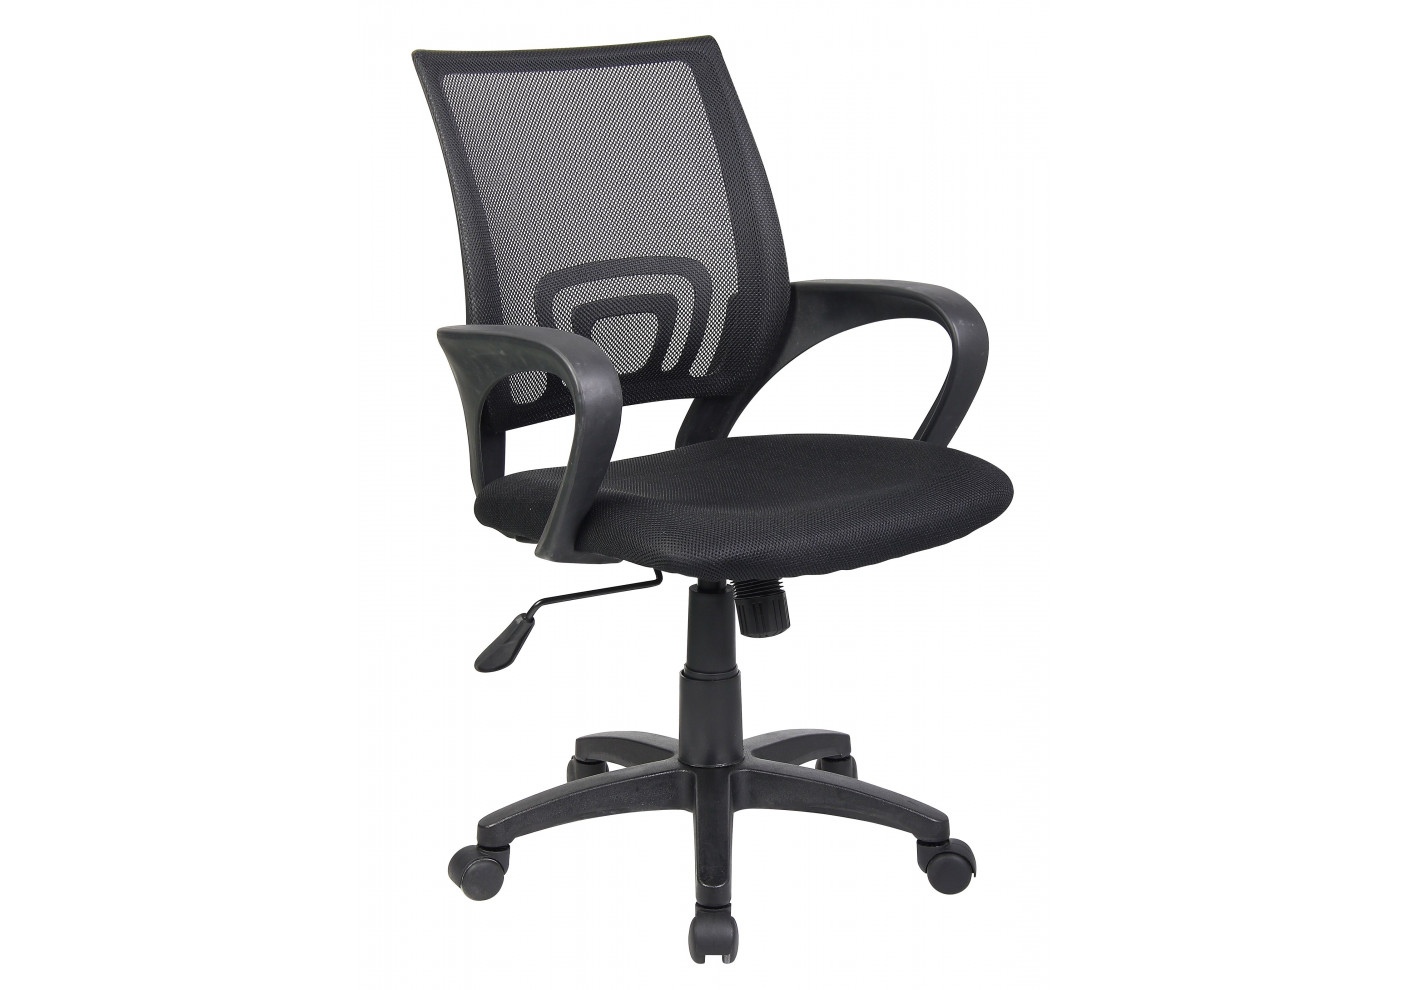 Chaise dactylo pop ii coloris noir vente de fauteuil de bureau